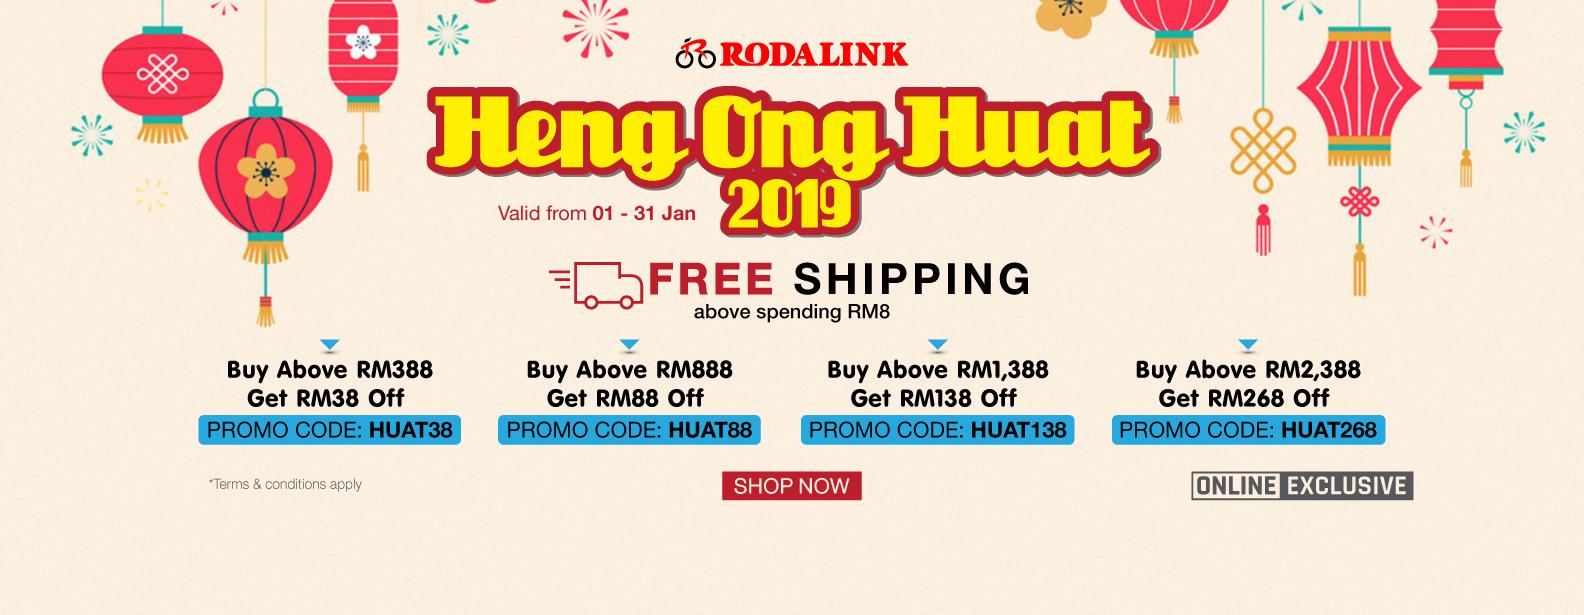 CNY Heng Ong Huat 2019